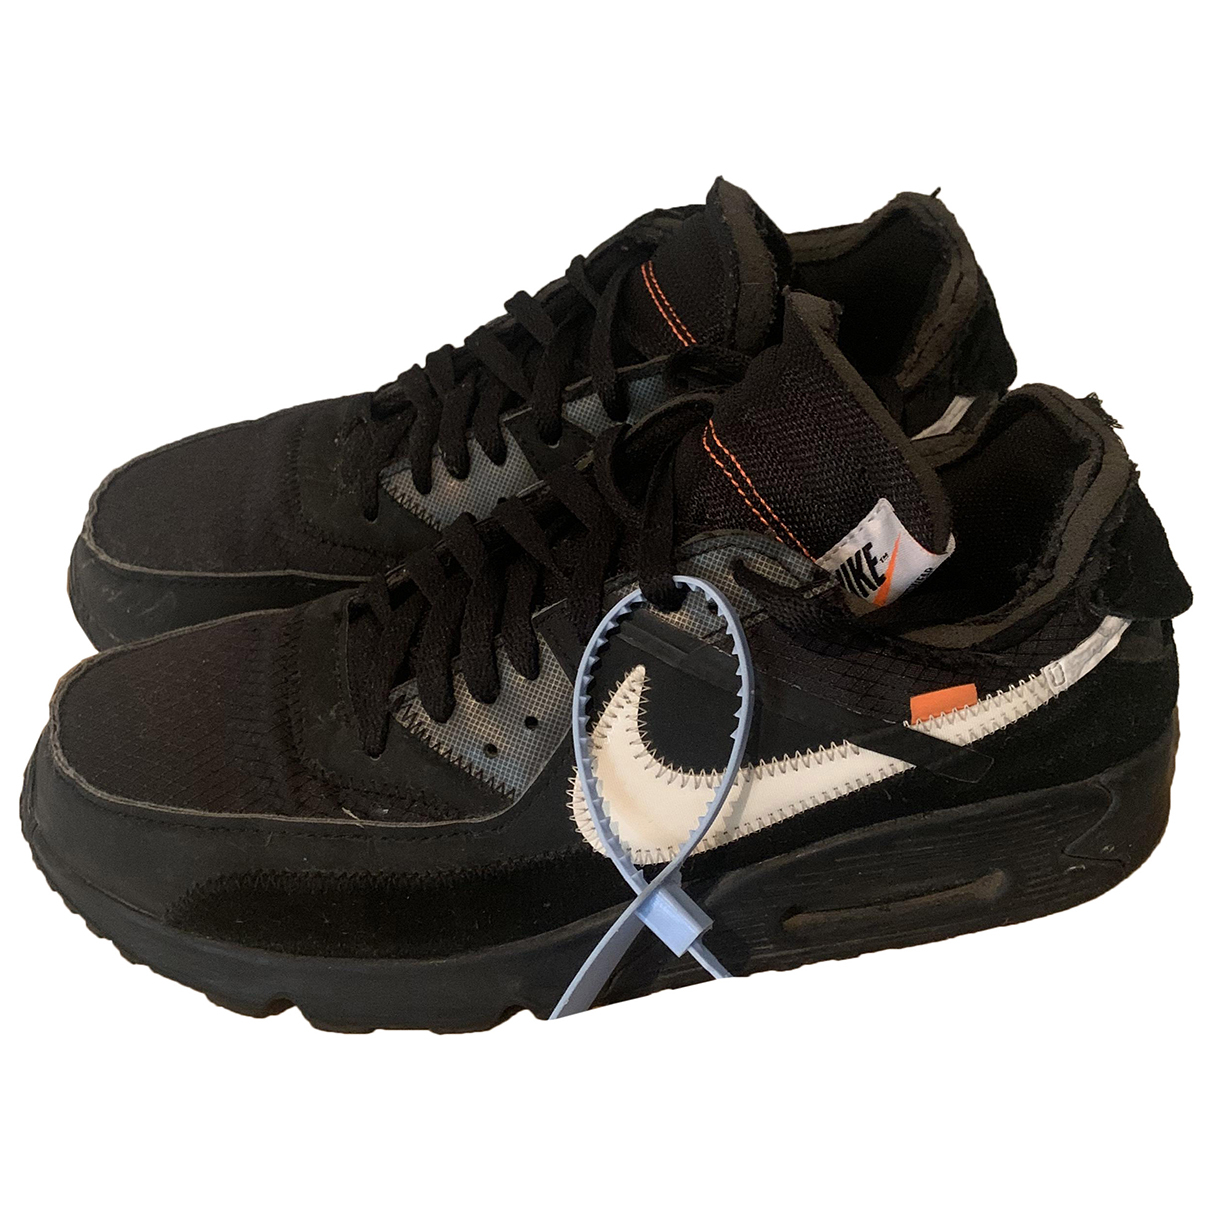 Nike X Off-white Air Max 90 Sneakers in  Schwarz Veloursleder